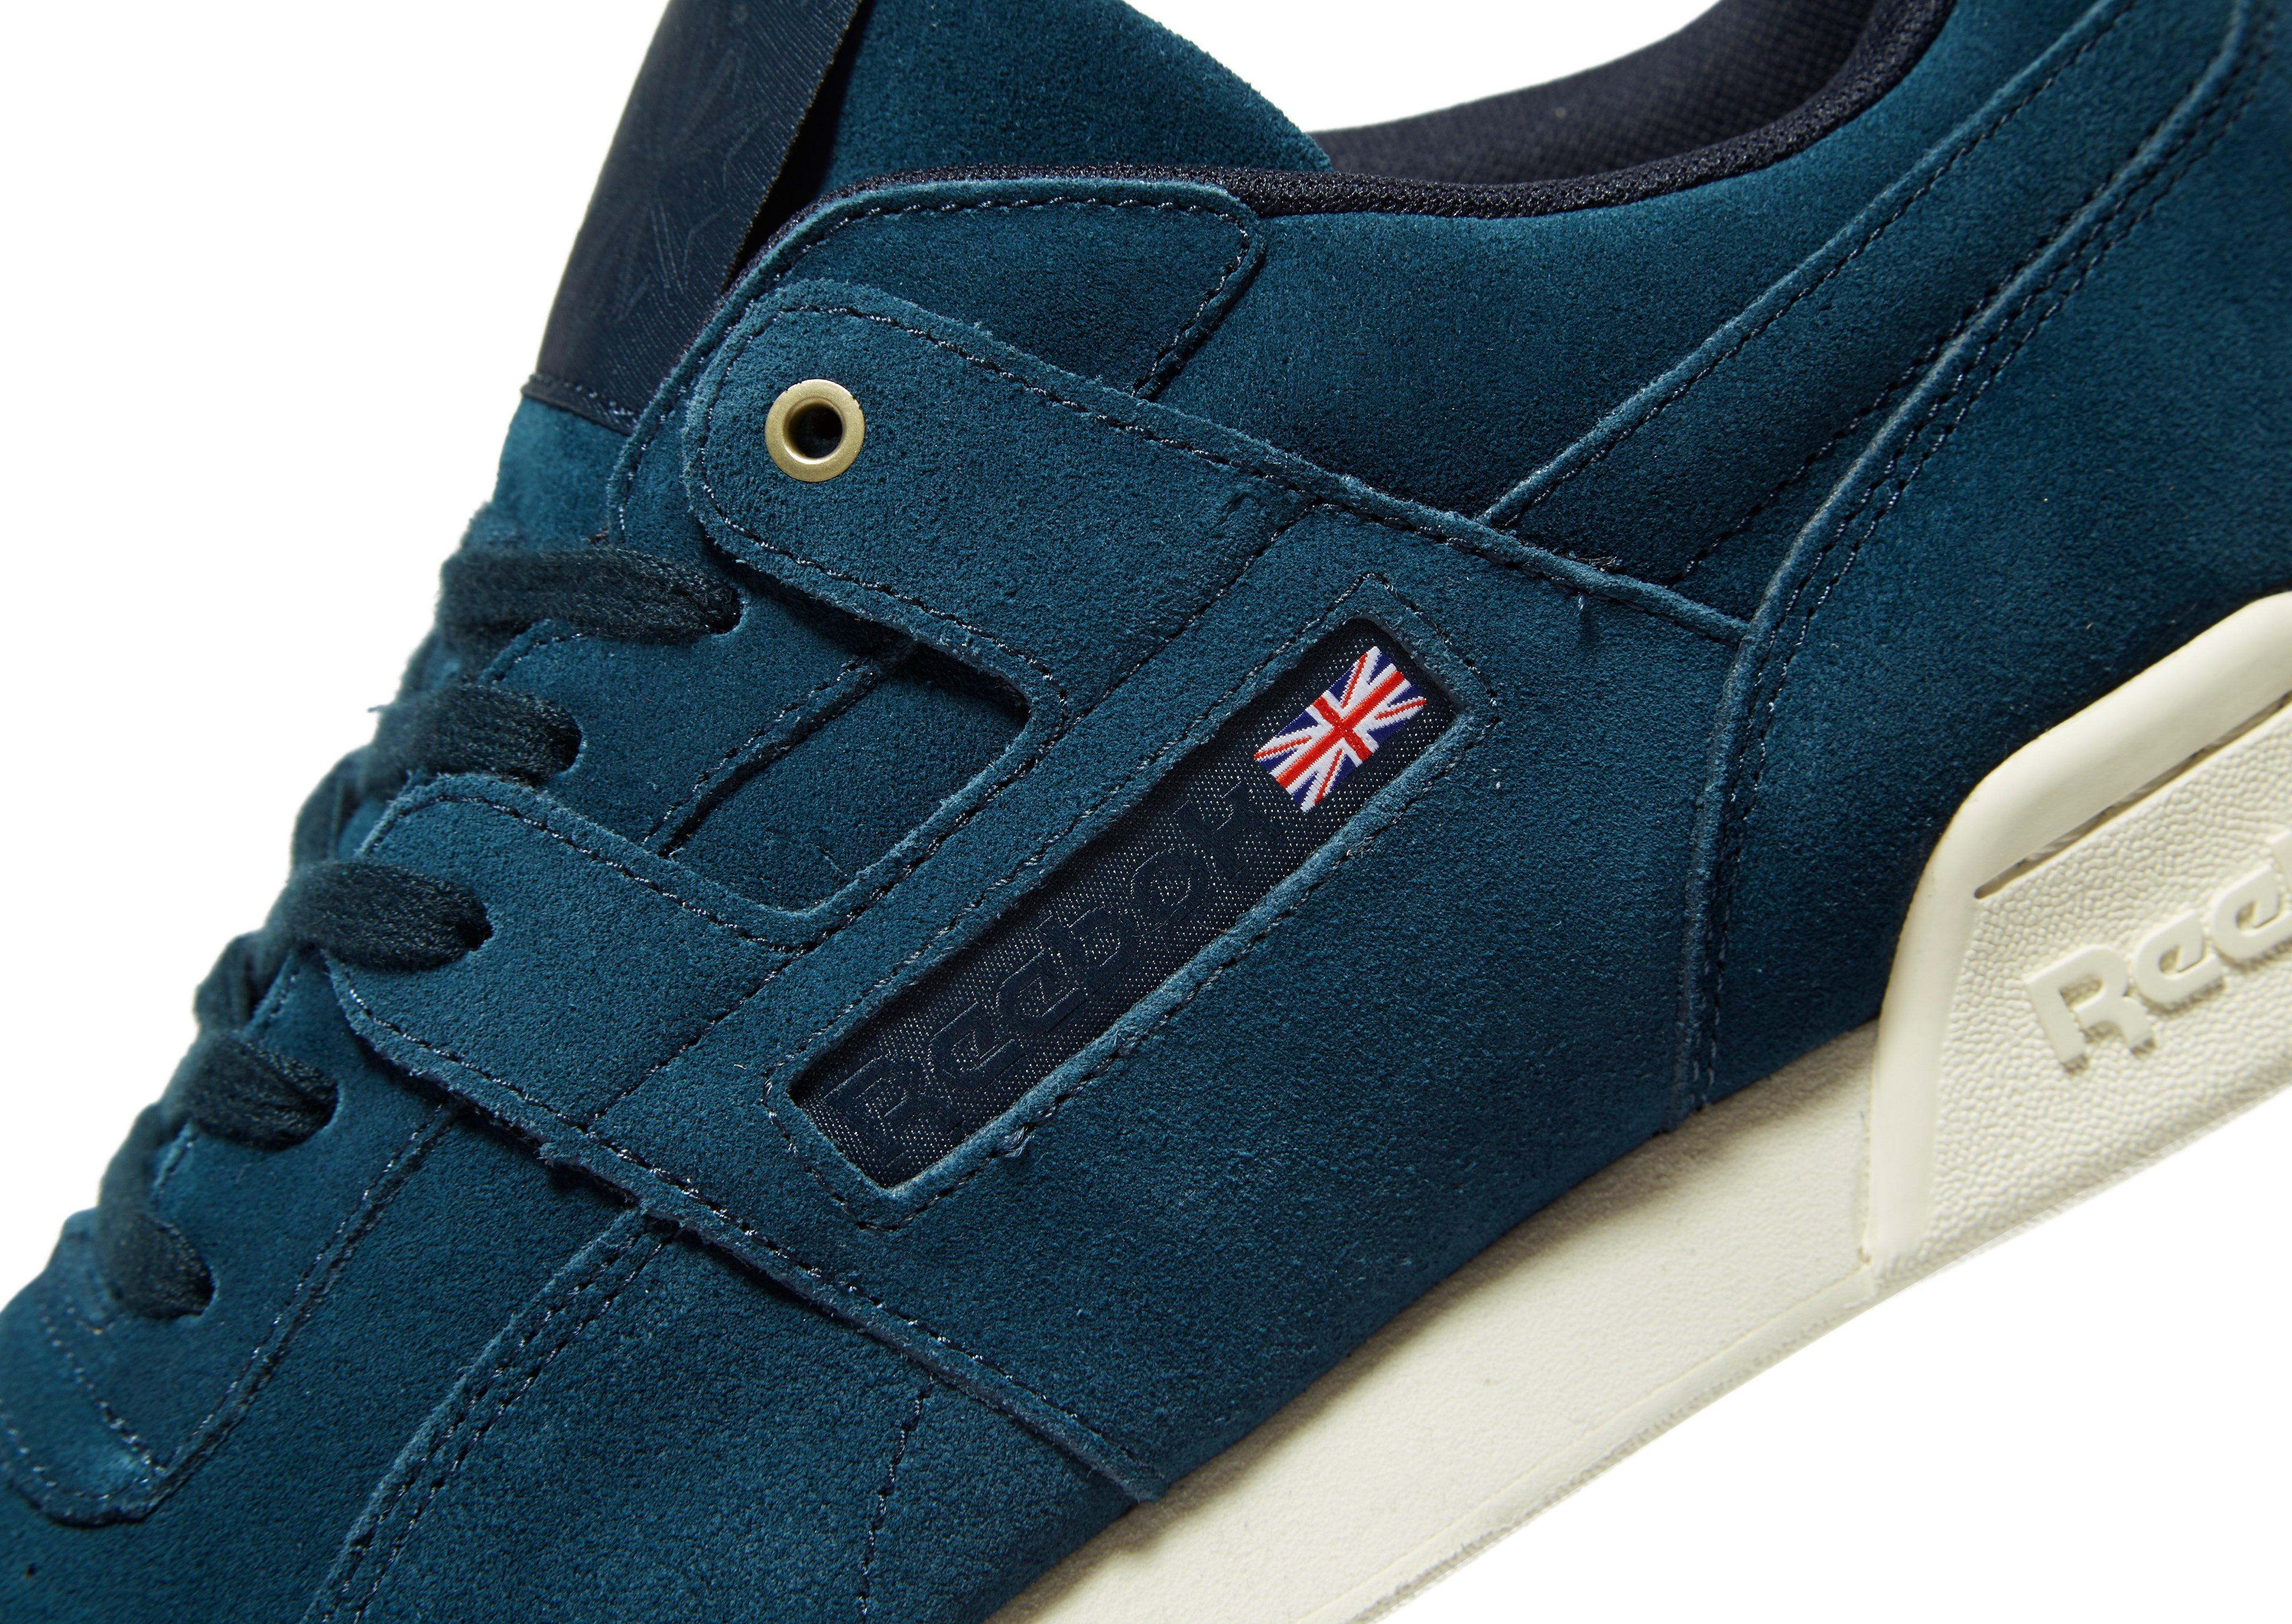 9923ed7673b63e Reebok Workout Plus Mcc in Blue for Men - Lyst